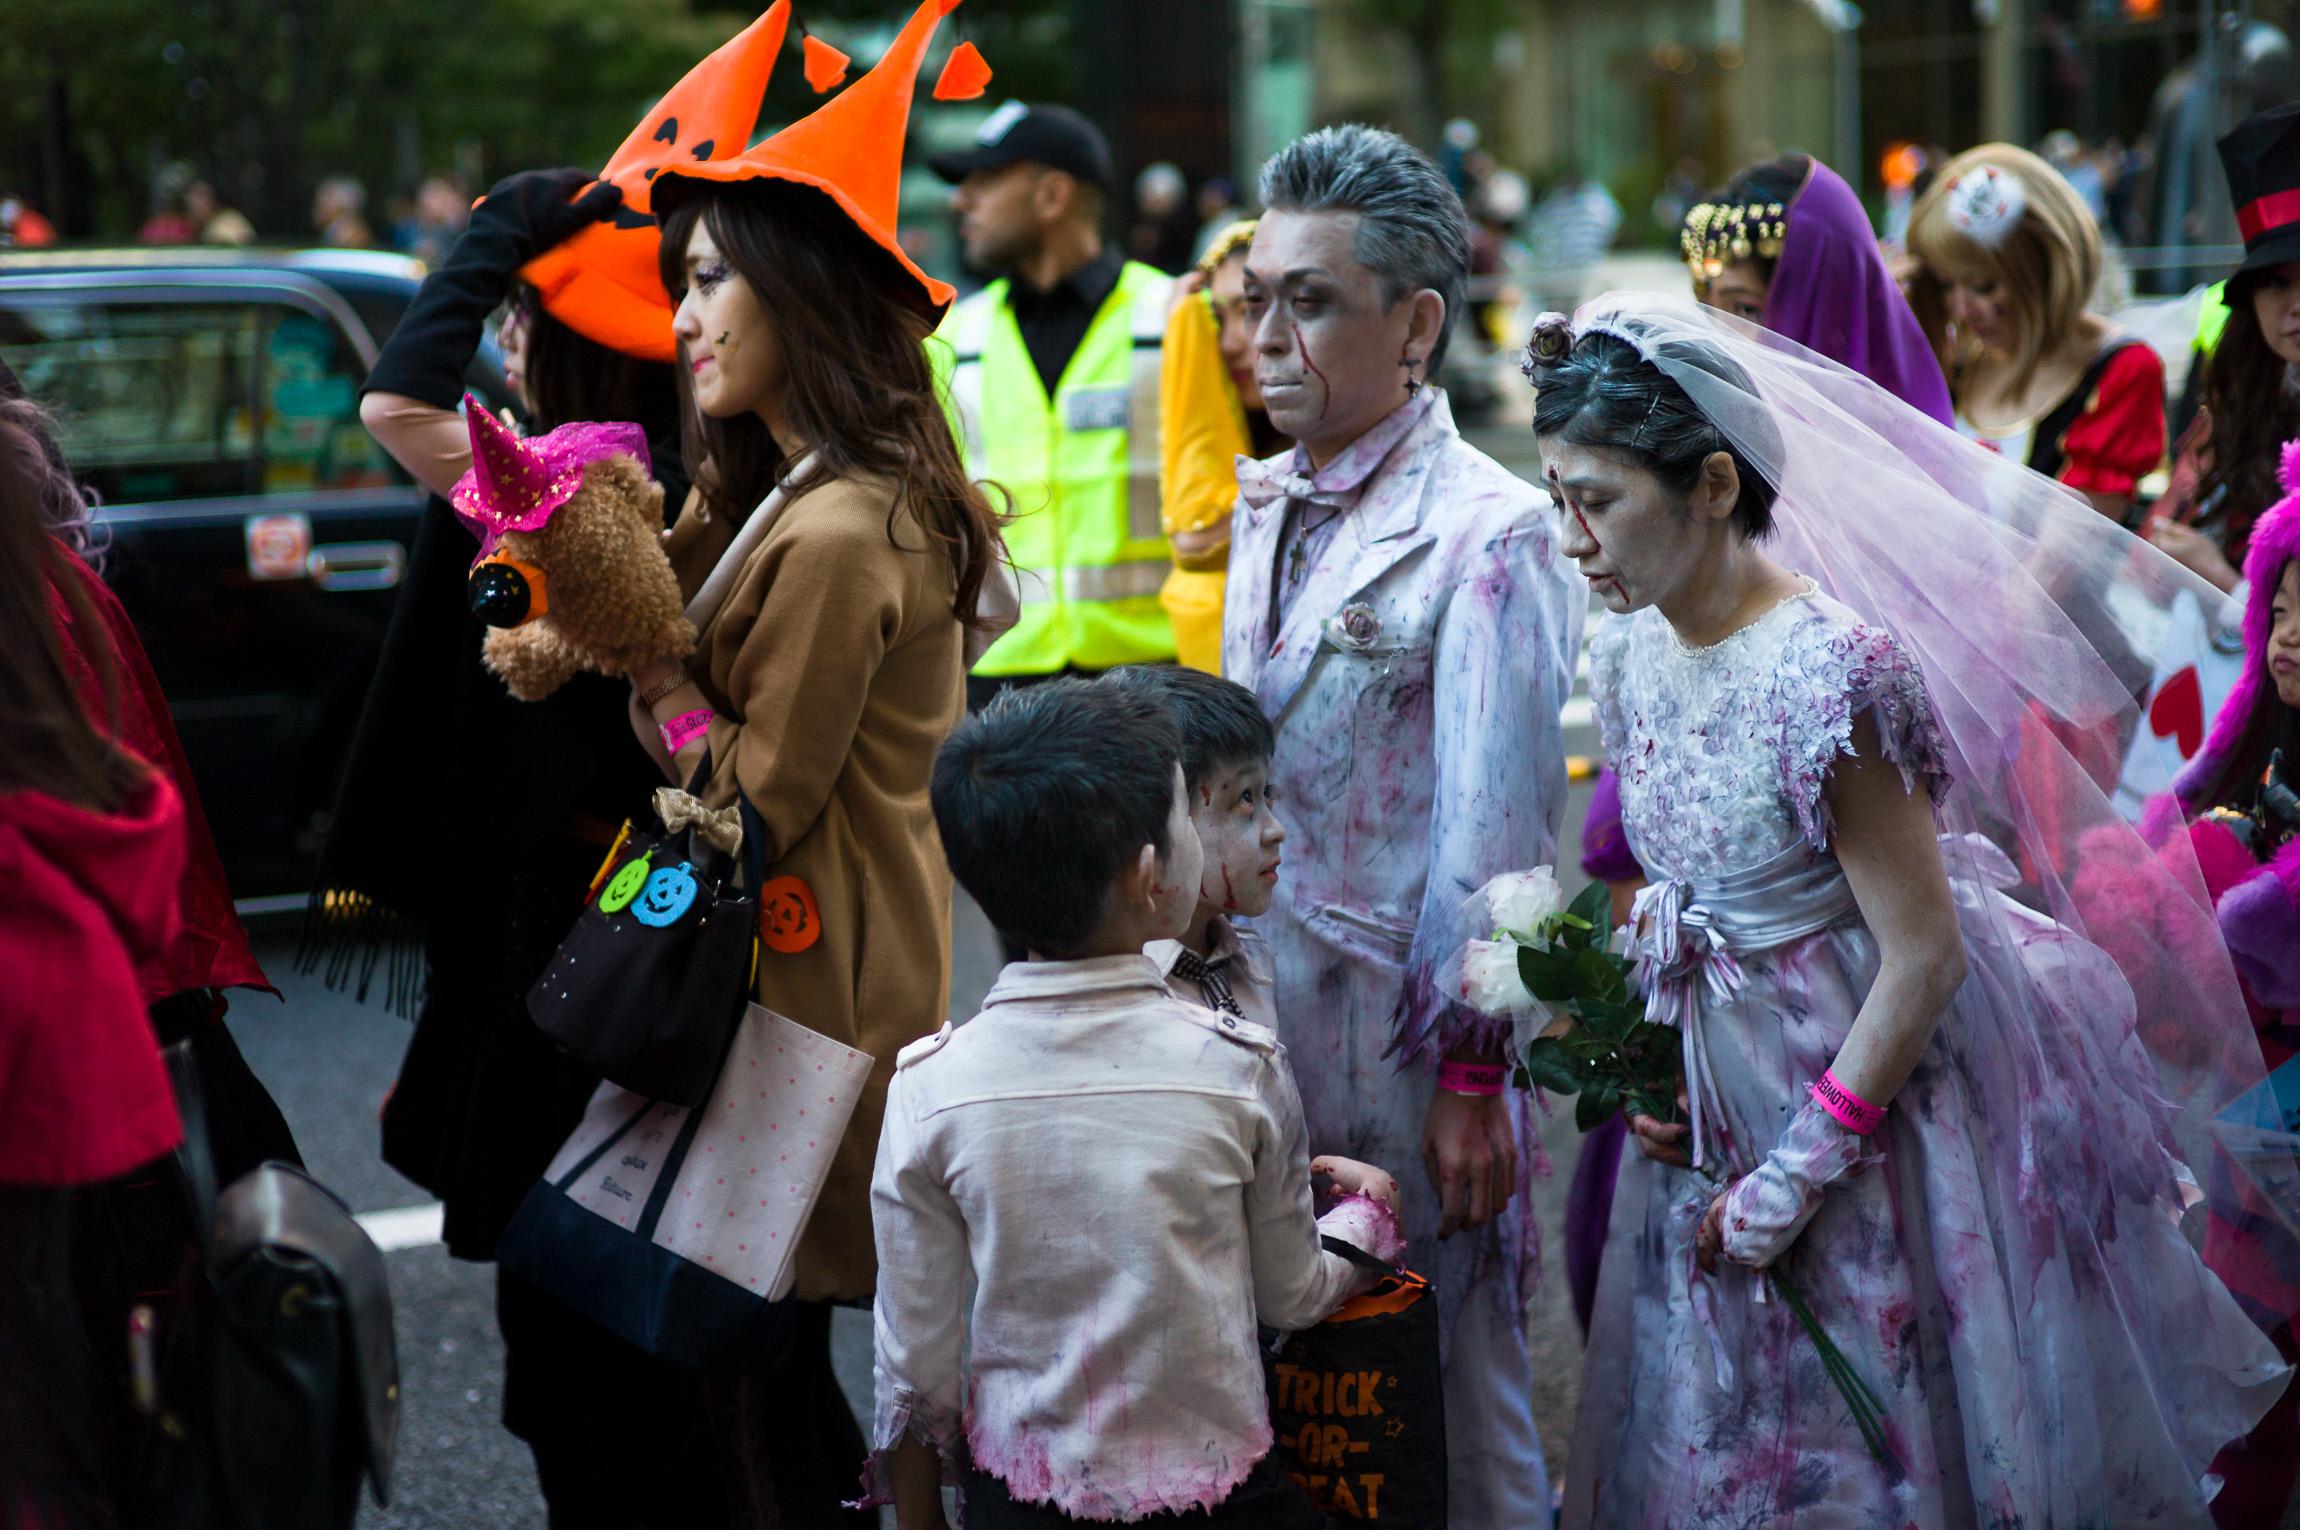 Roppongi Halloween, Tokyo, Japan Leica M-E Carl Zeiss Sonnar 50/1.5 ZM